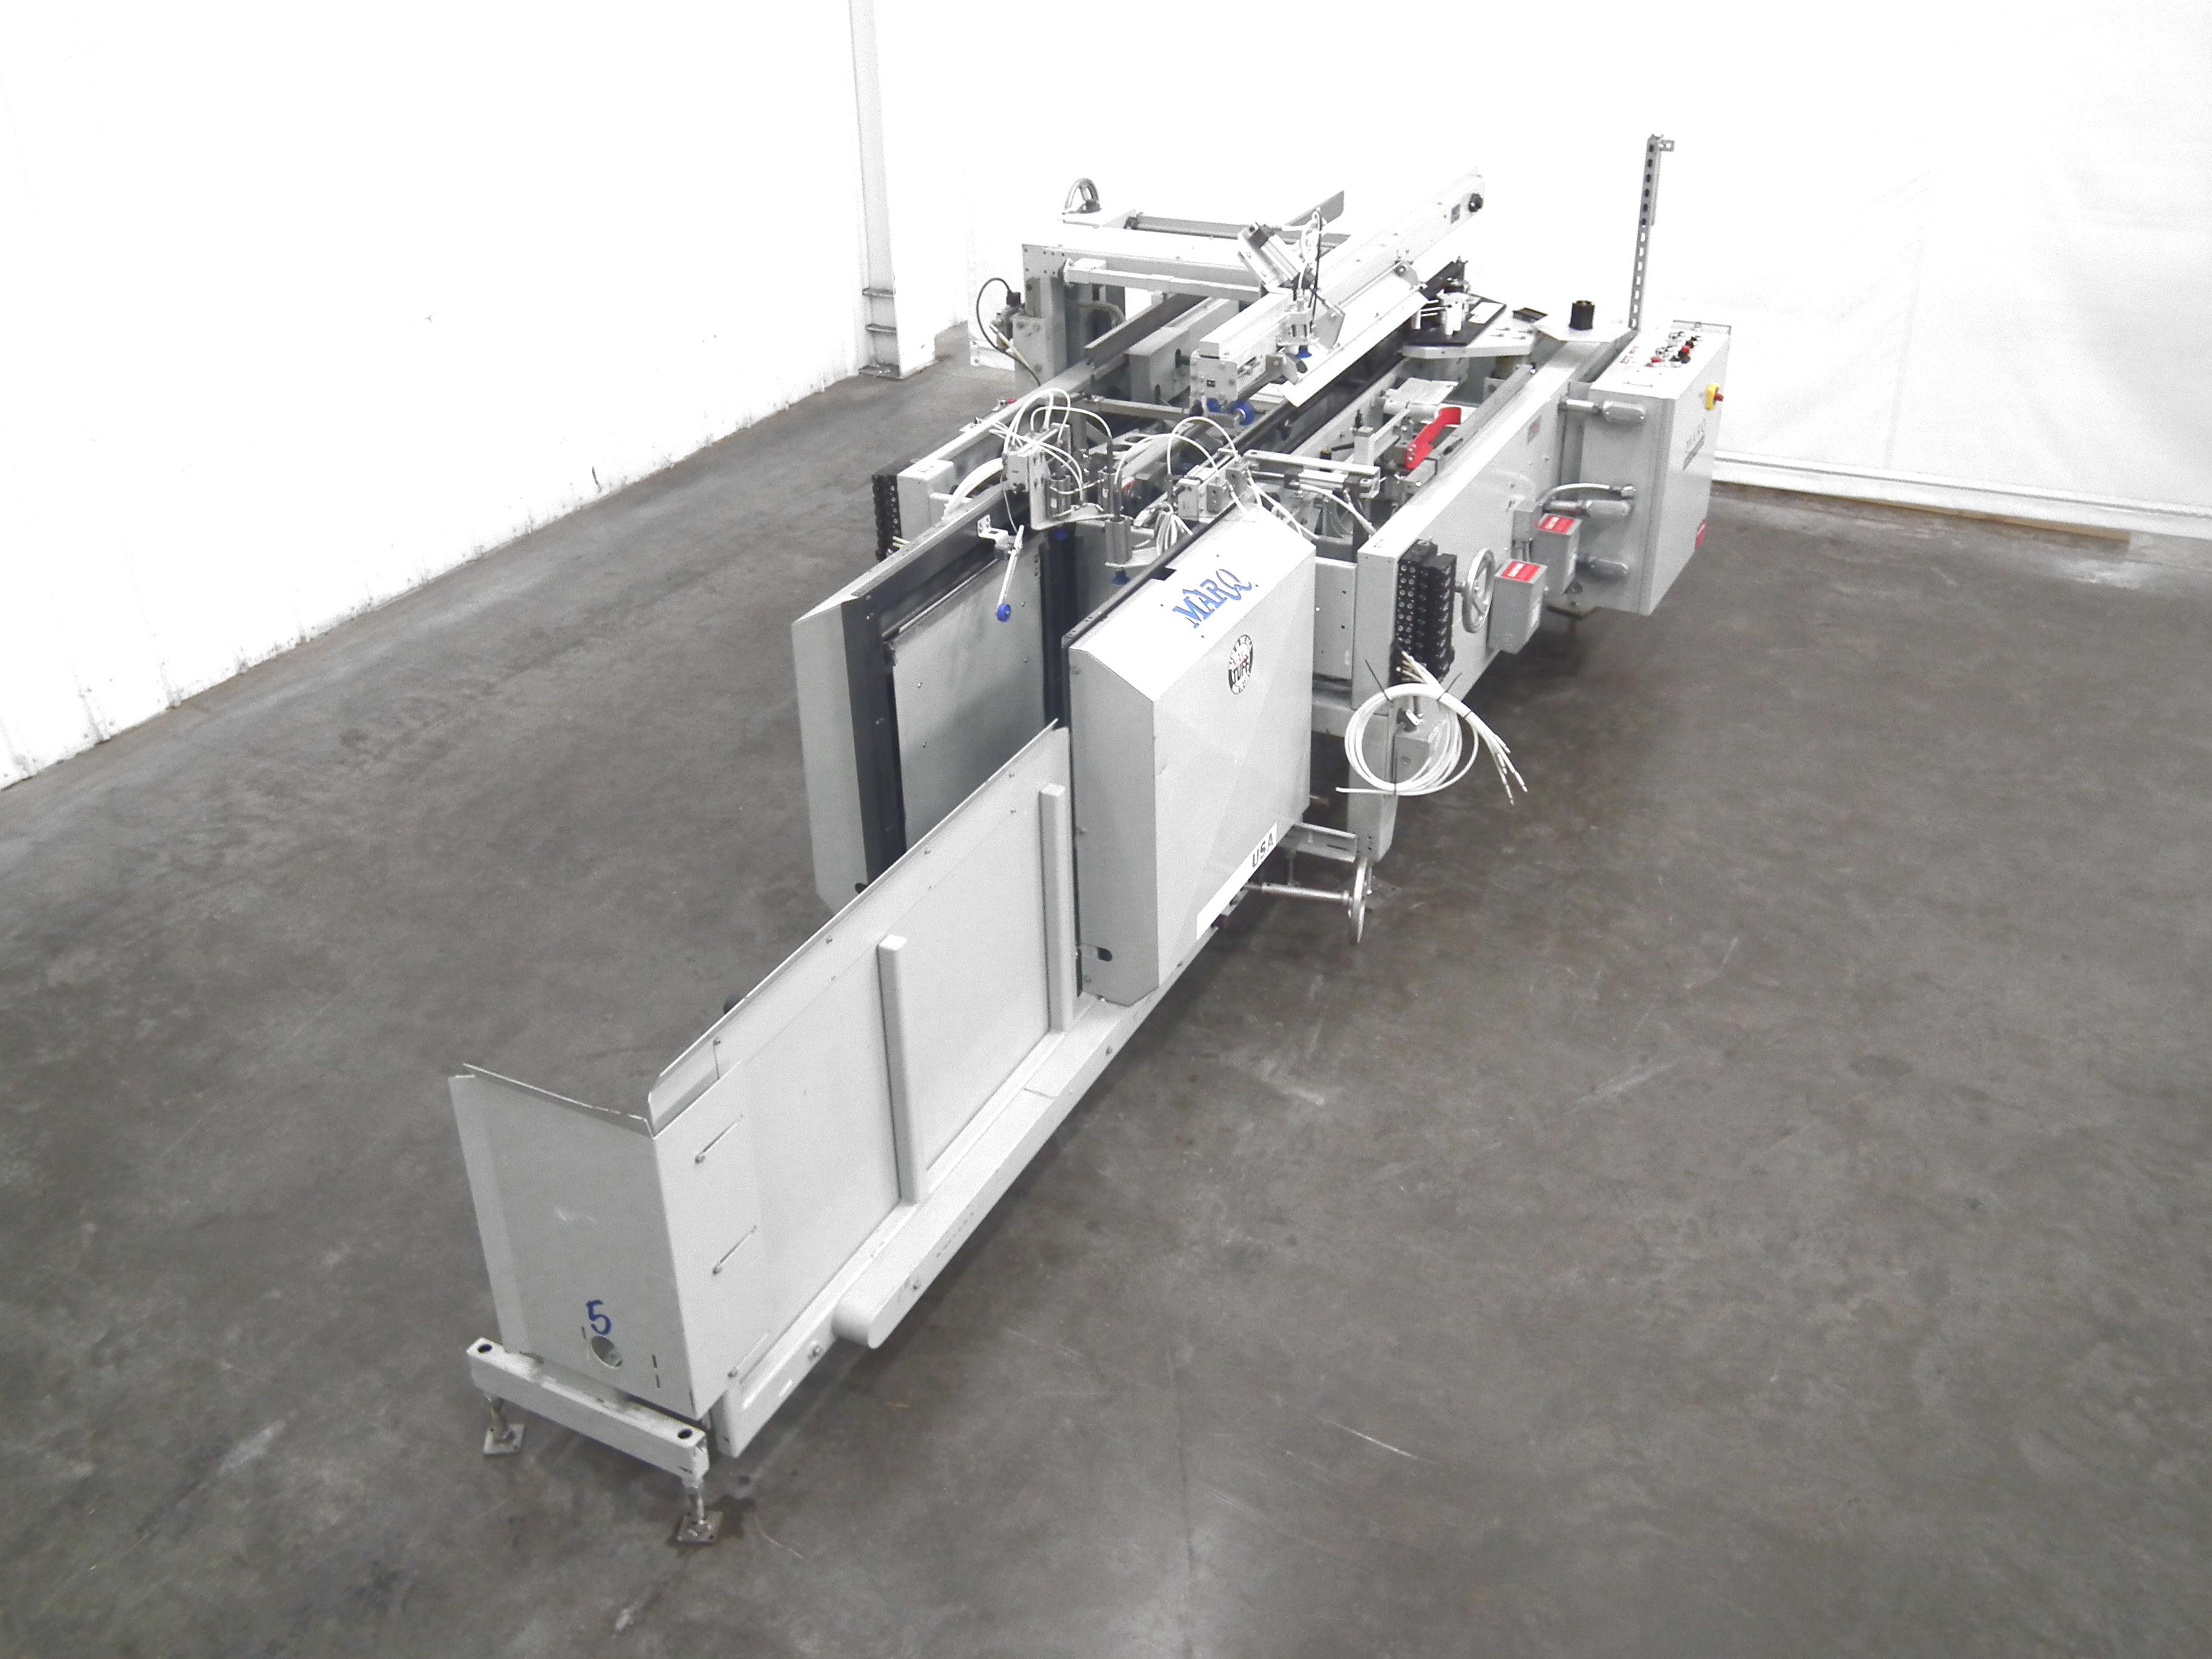 Marq Tuff HPE-NS-MF/RH/DL Bottom Tape Case Erector A9697 - Image 11 of 15